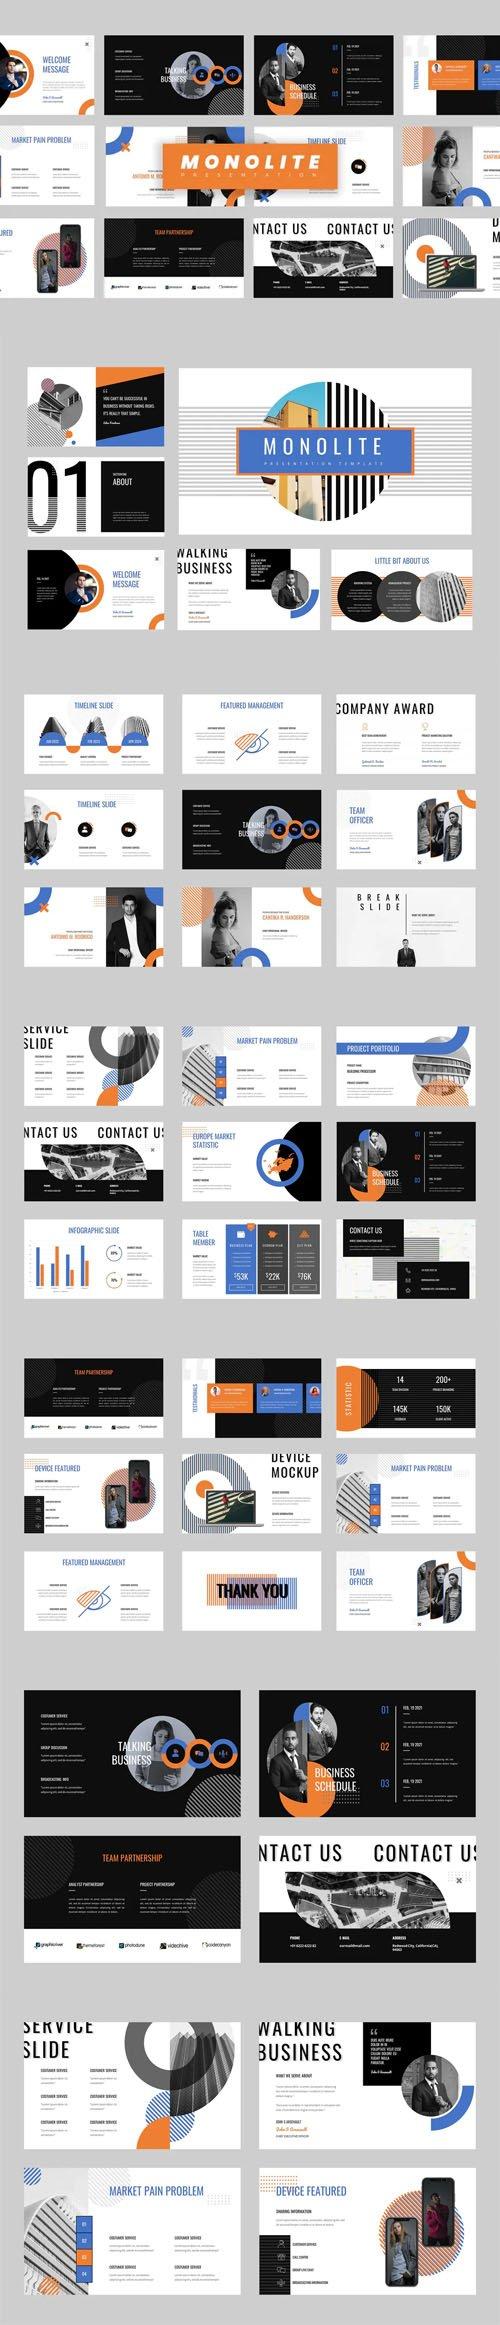 Monolite - Education [PowerPoint - Keynote - Google Slides] Presentations